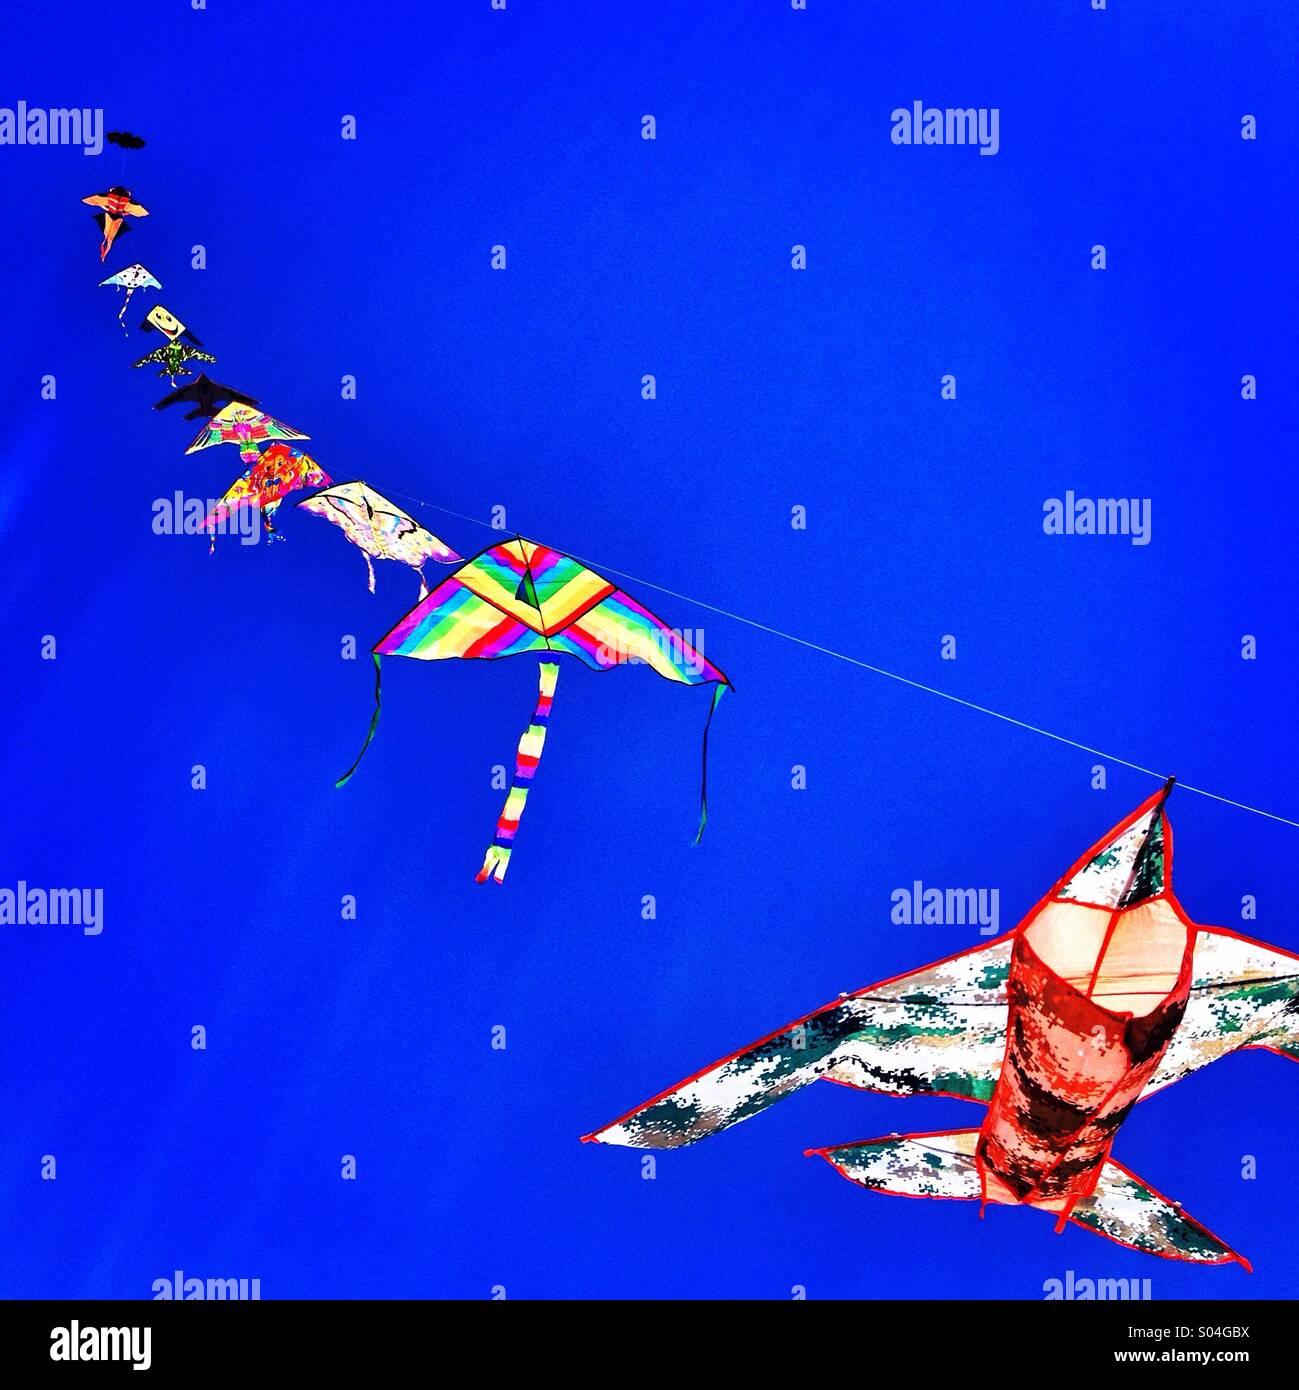 Children flying kites and blue sky - Stock Image